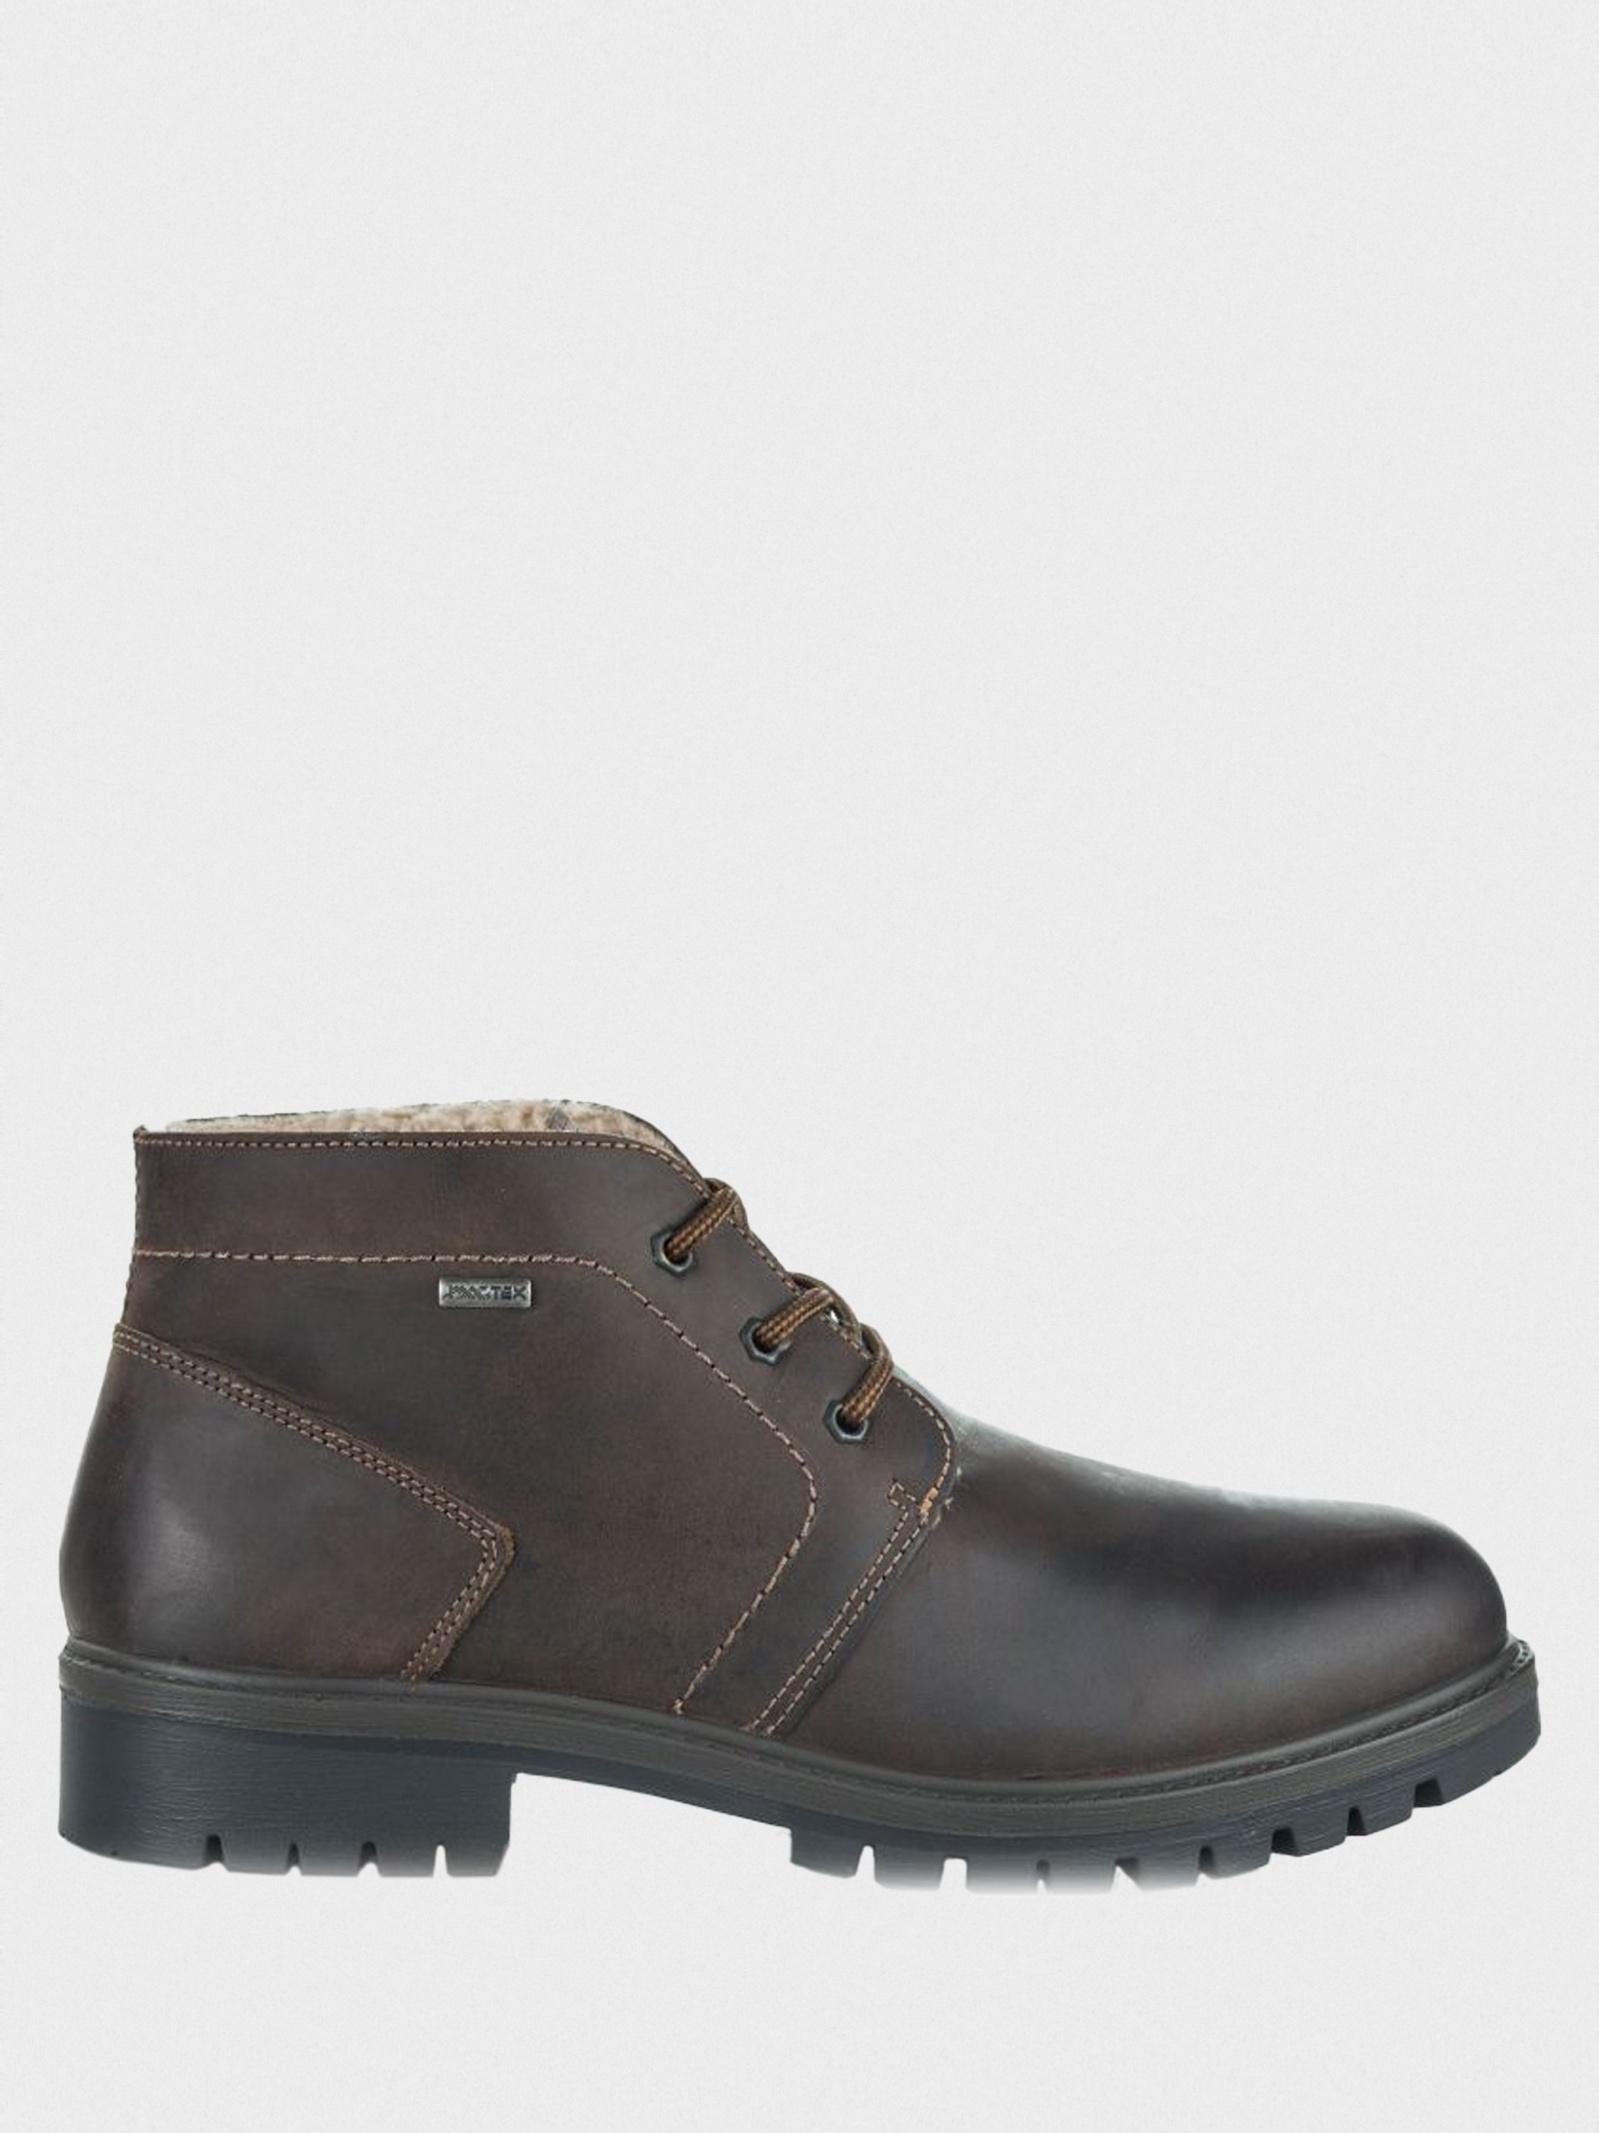 Ботинки для мужчин IMAC TIBET YH92 купить в Интертоп, 2017